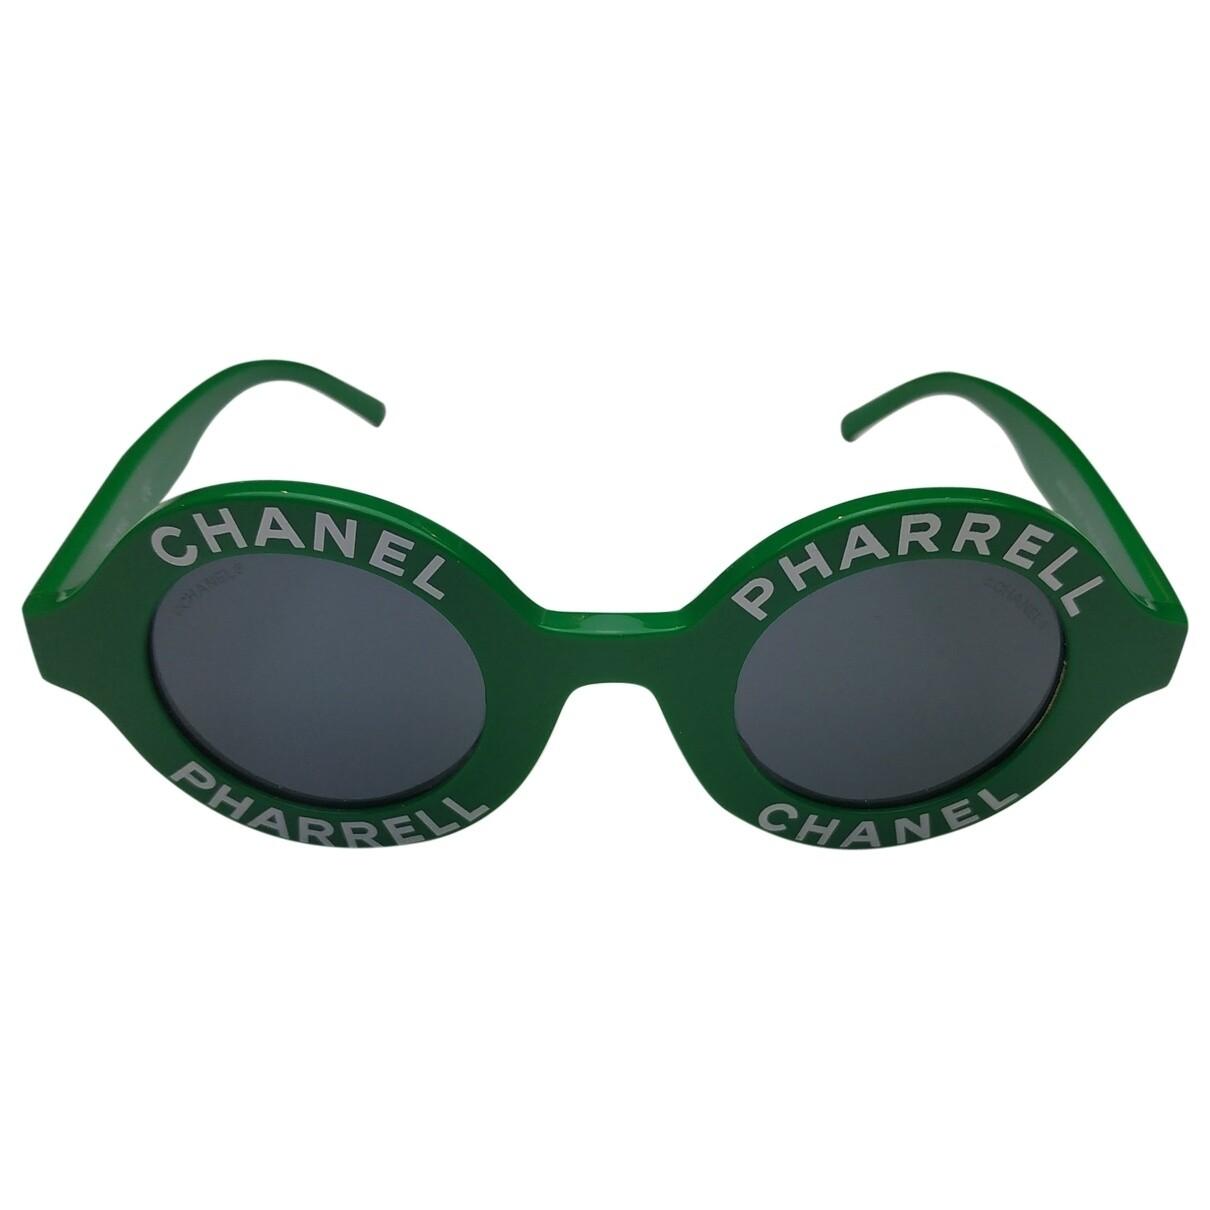 Chanel x Pharrell Williams Sunglasses